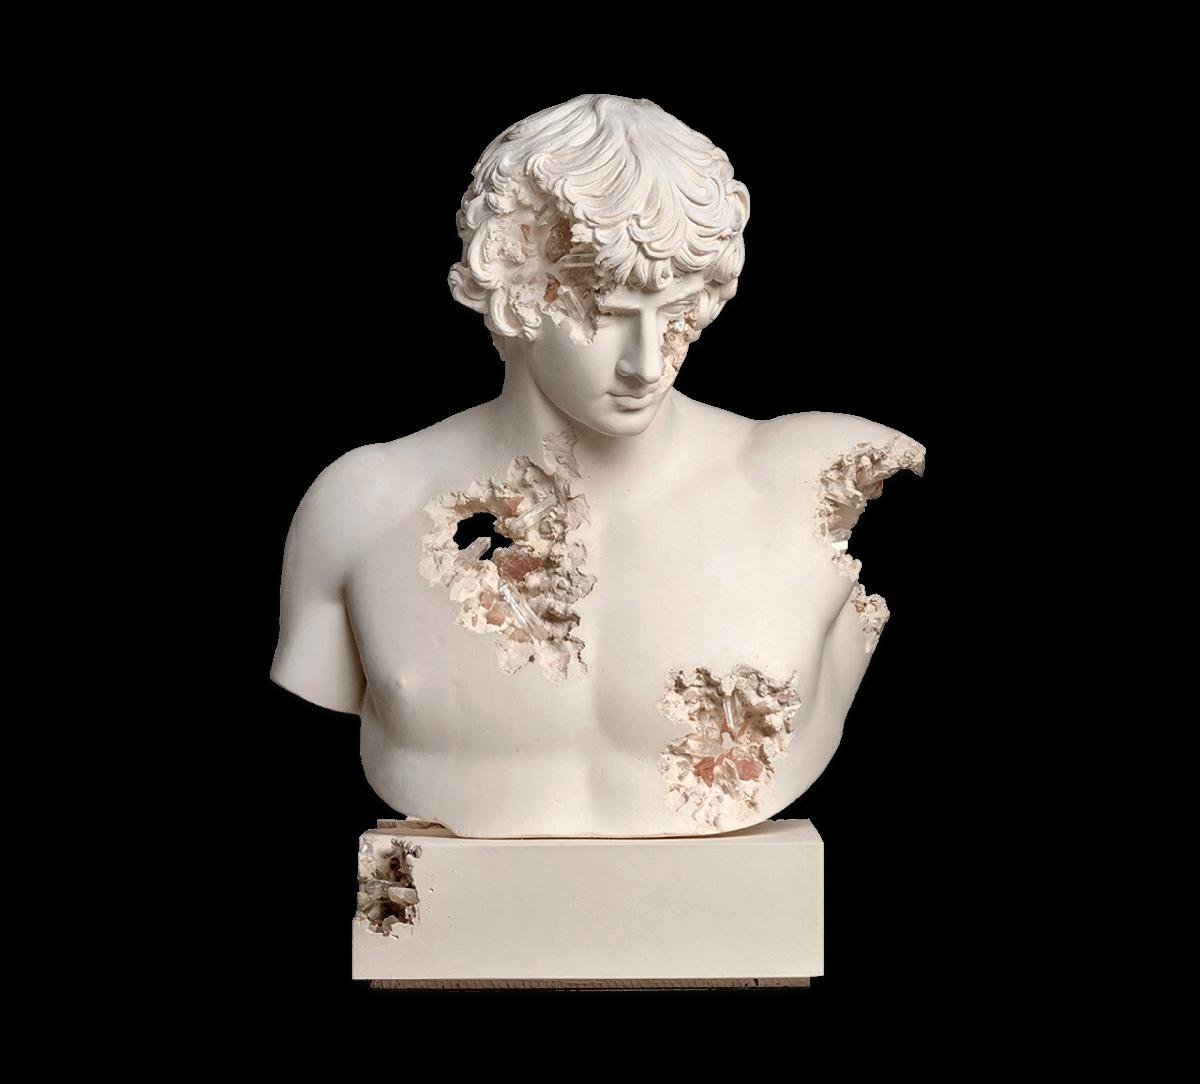 Daniel Arsham | Bust of Antinous | 2021 Image